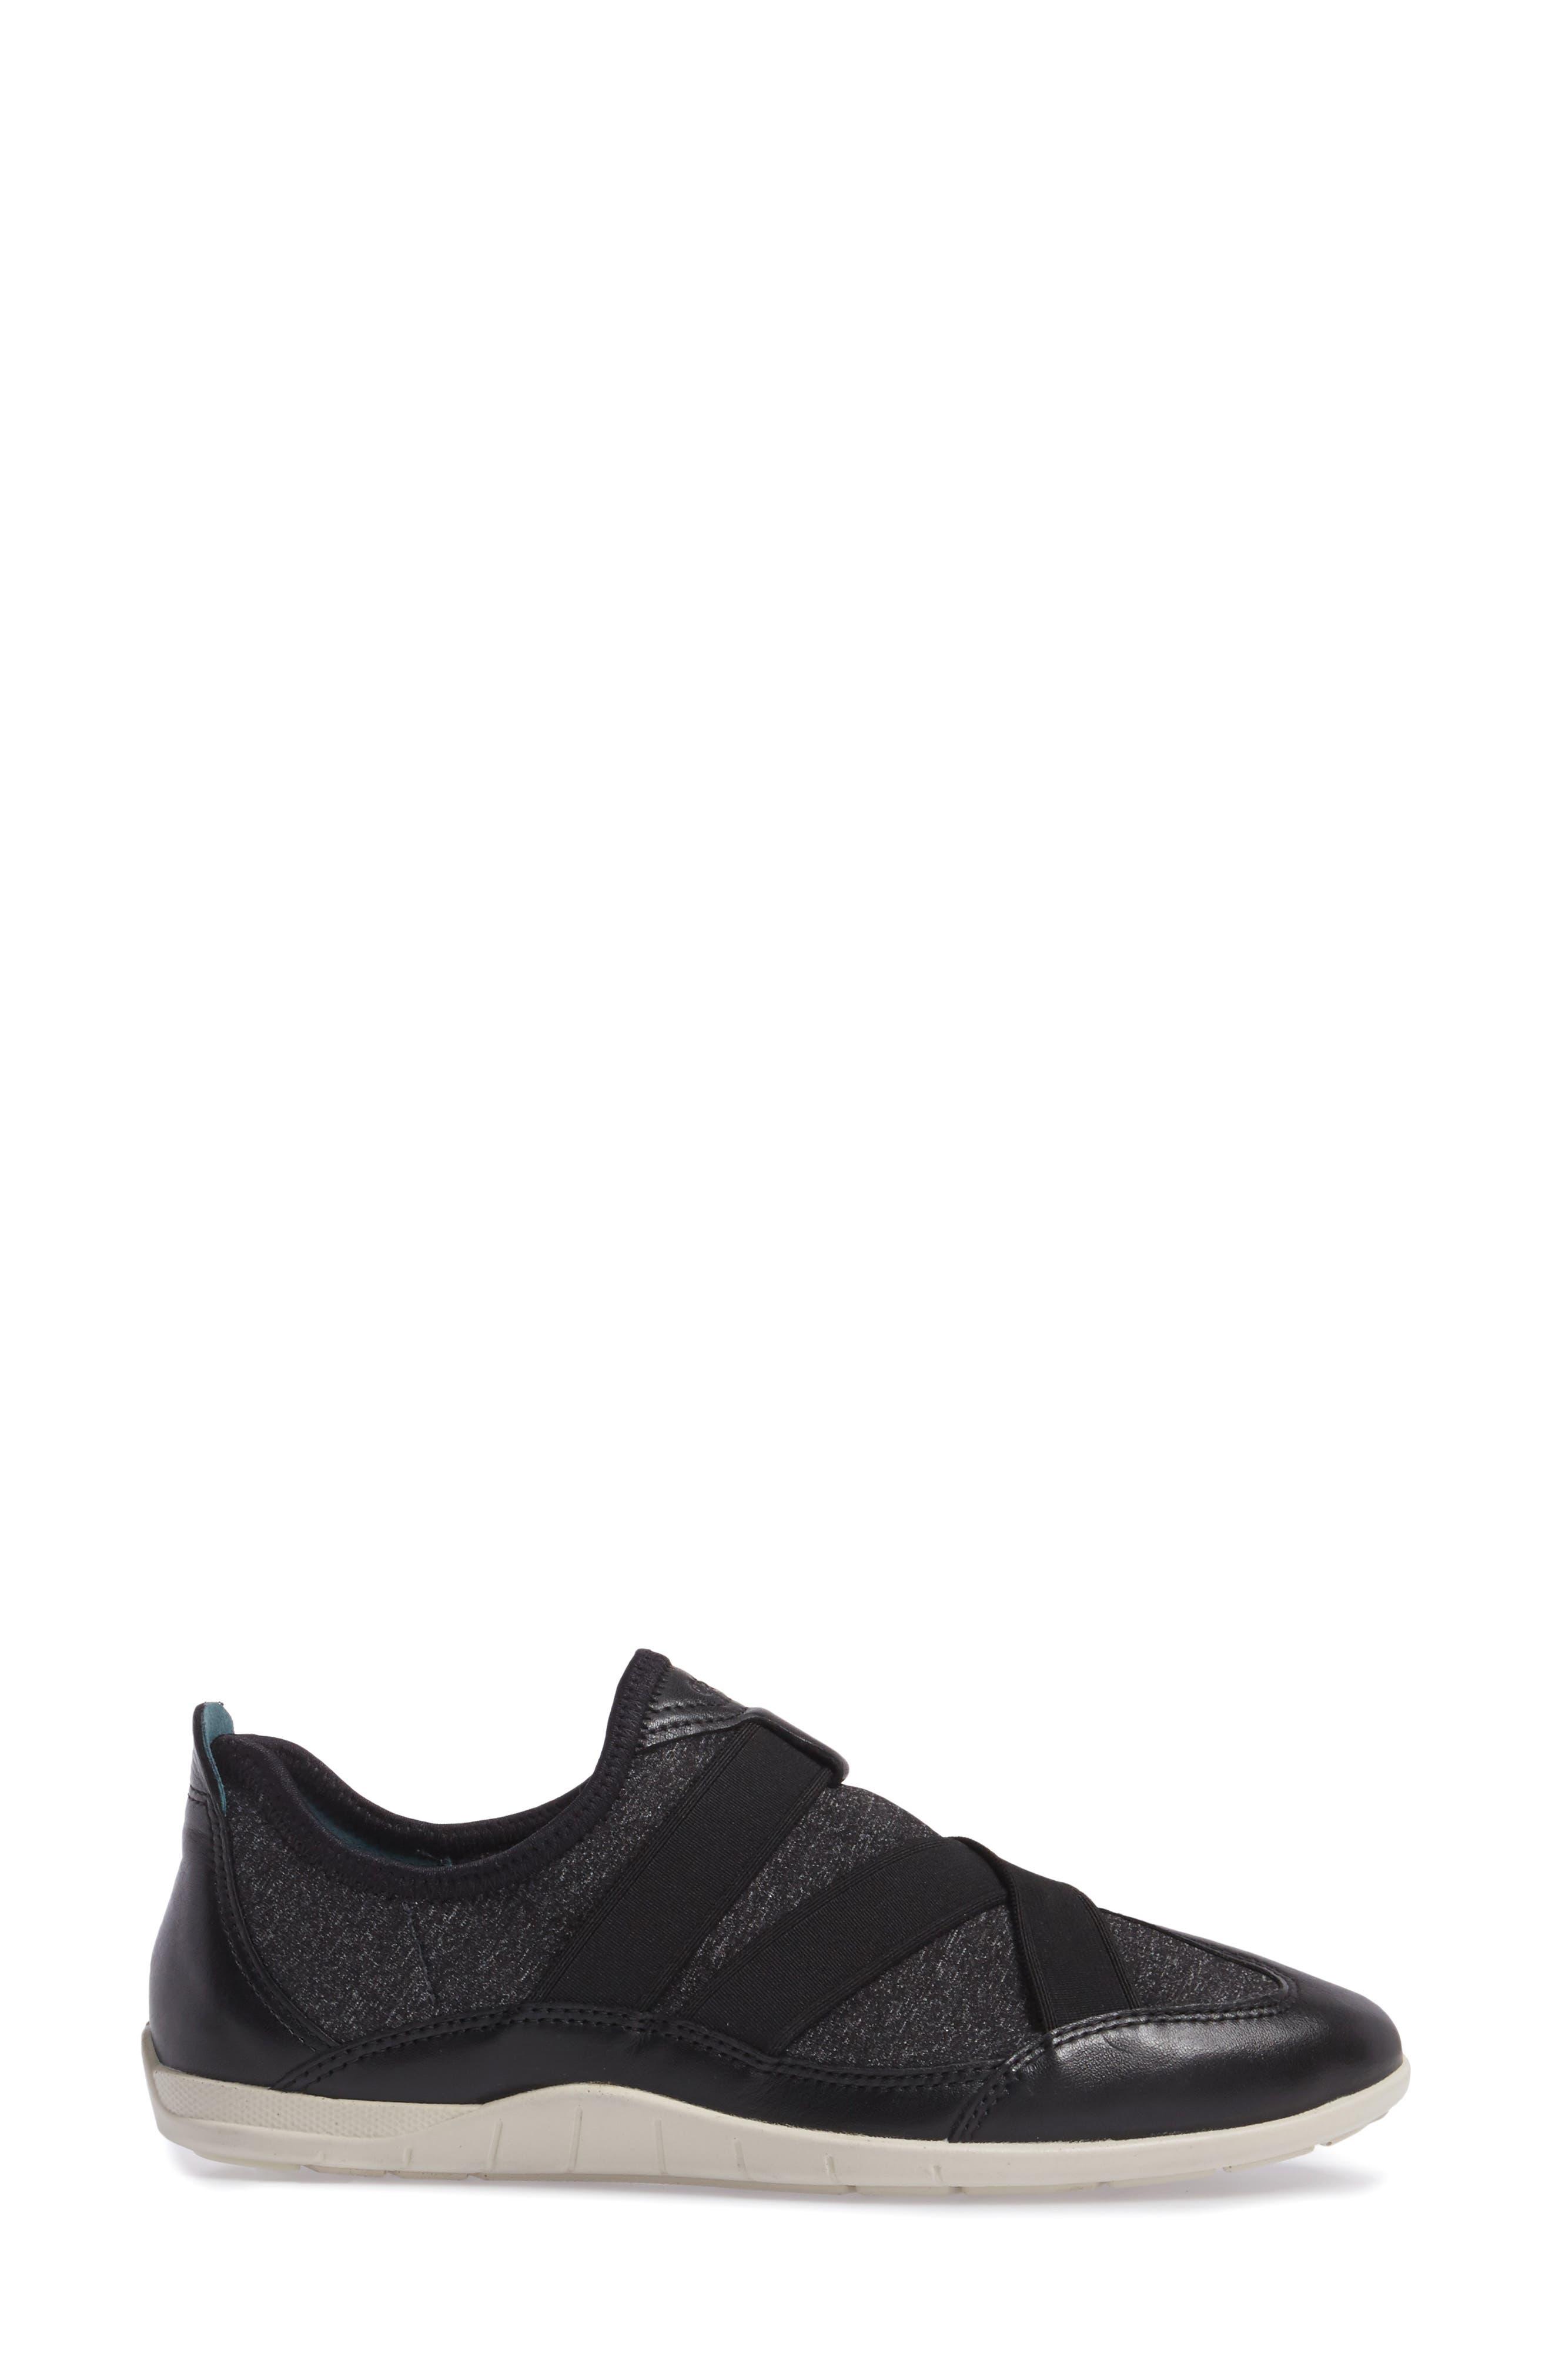 'Bluma' Sneaker,                             Alternate thumbnail 3, color,                             010